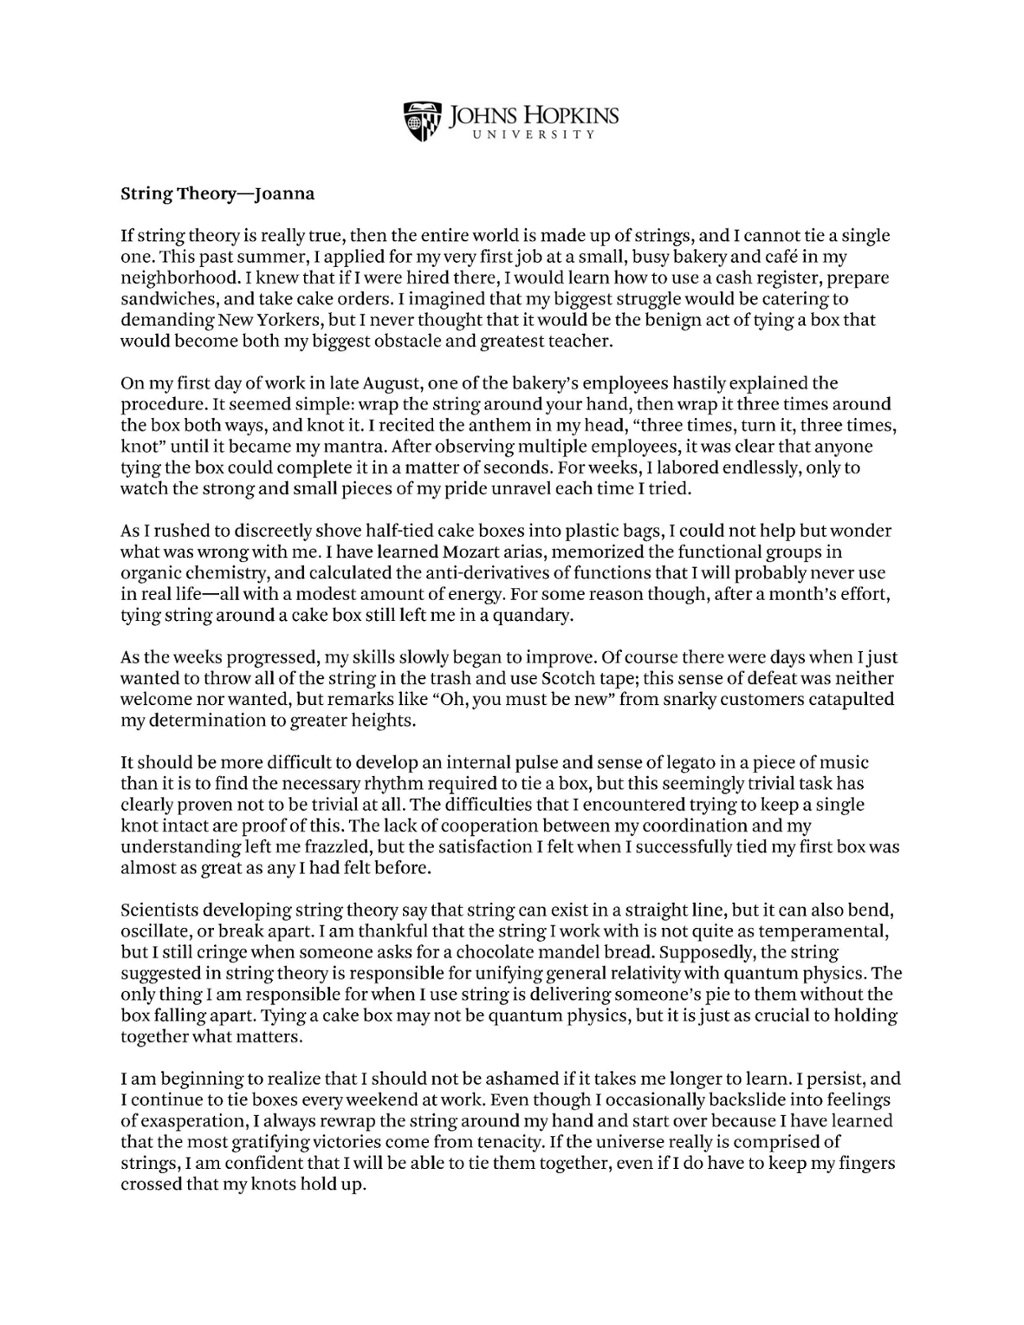 Buy Essay London - Best way to write a college essay - Write My ...